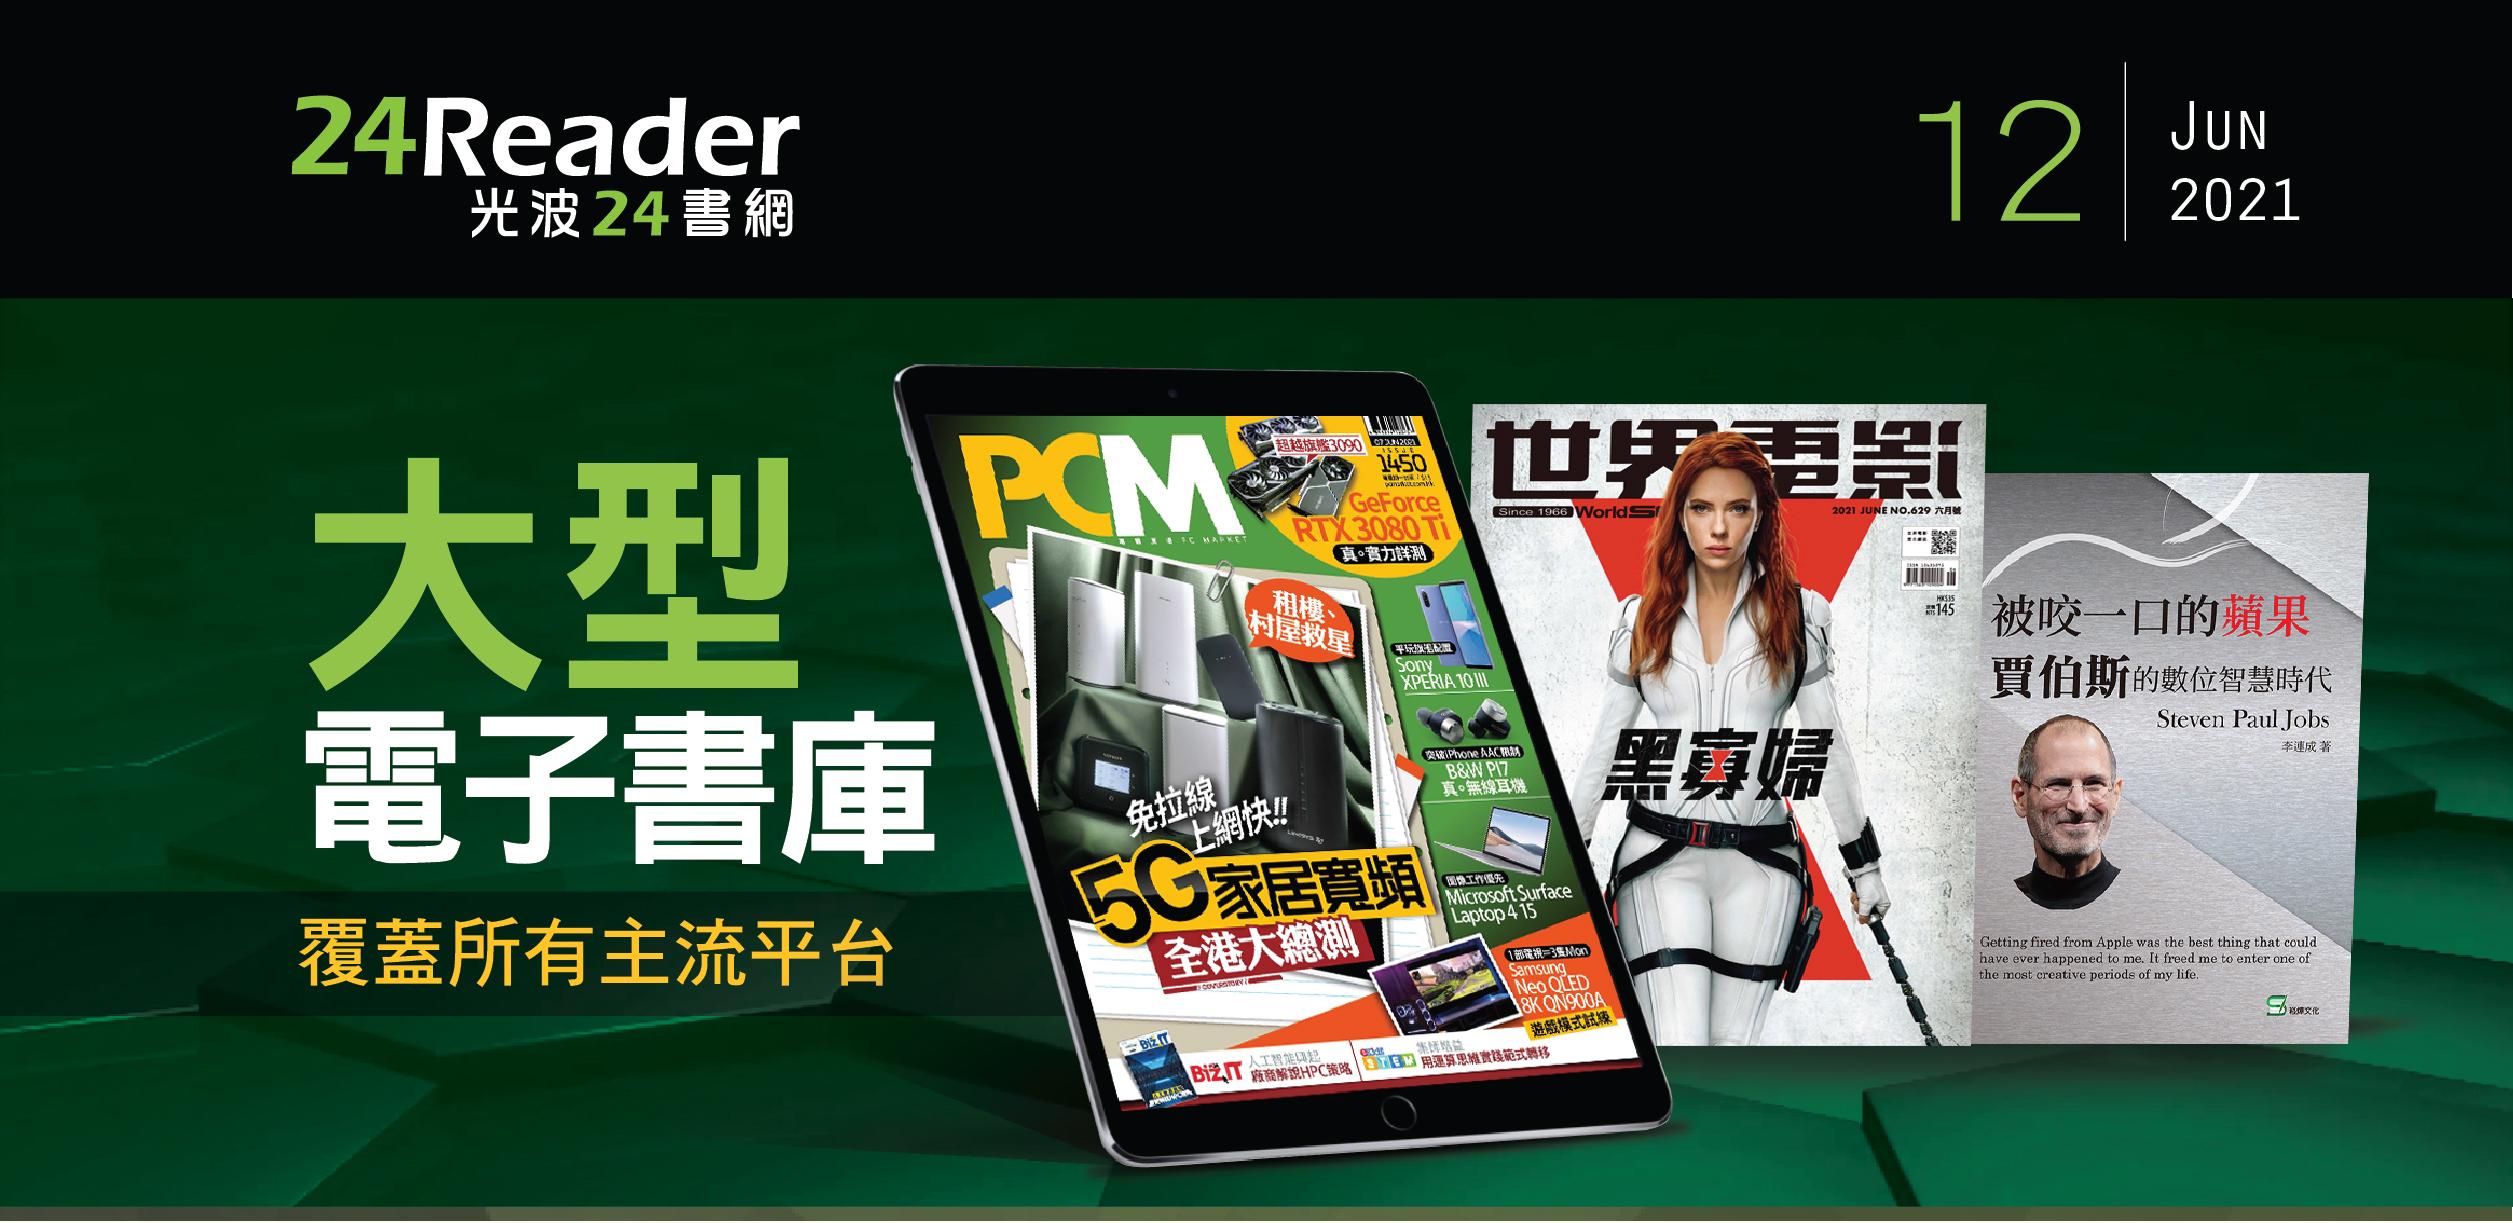 《PC Market 電腦廣場》5G 家居寬頻全港大總測